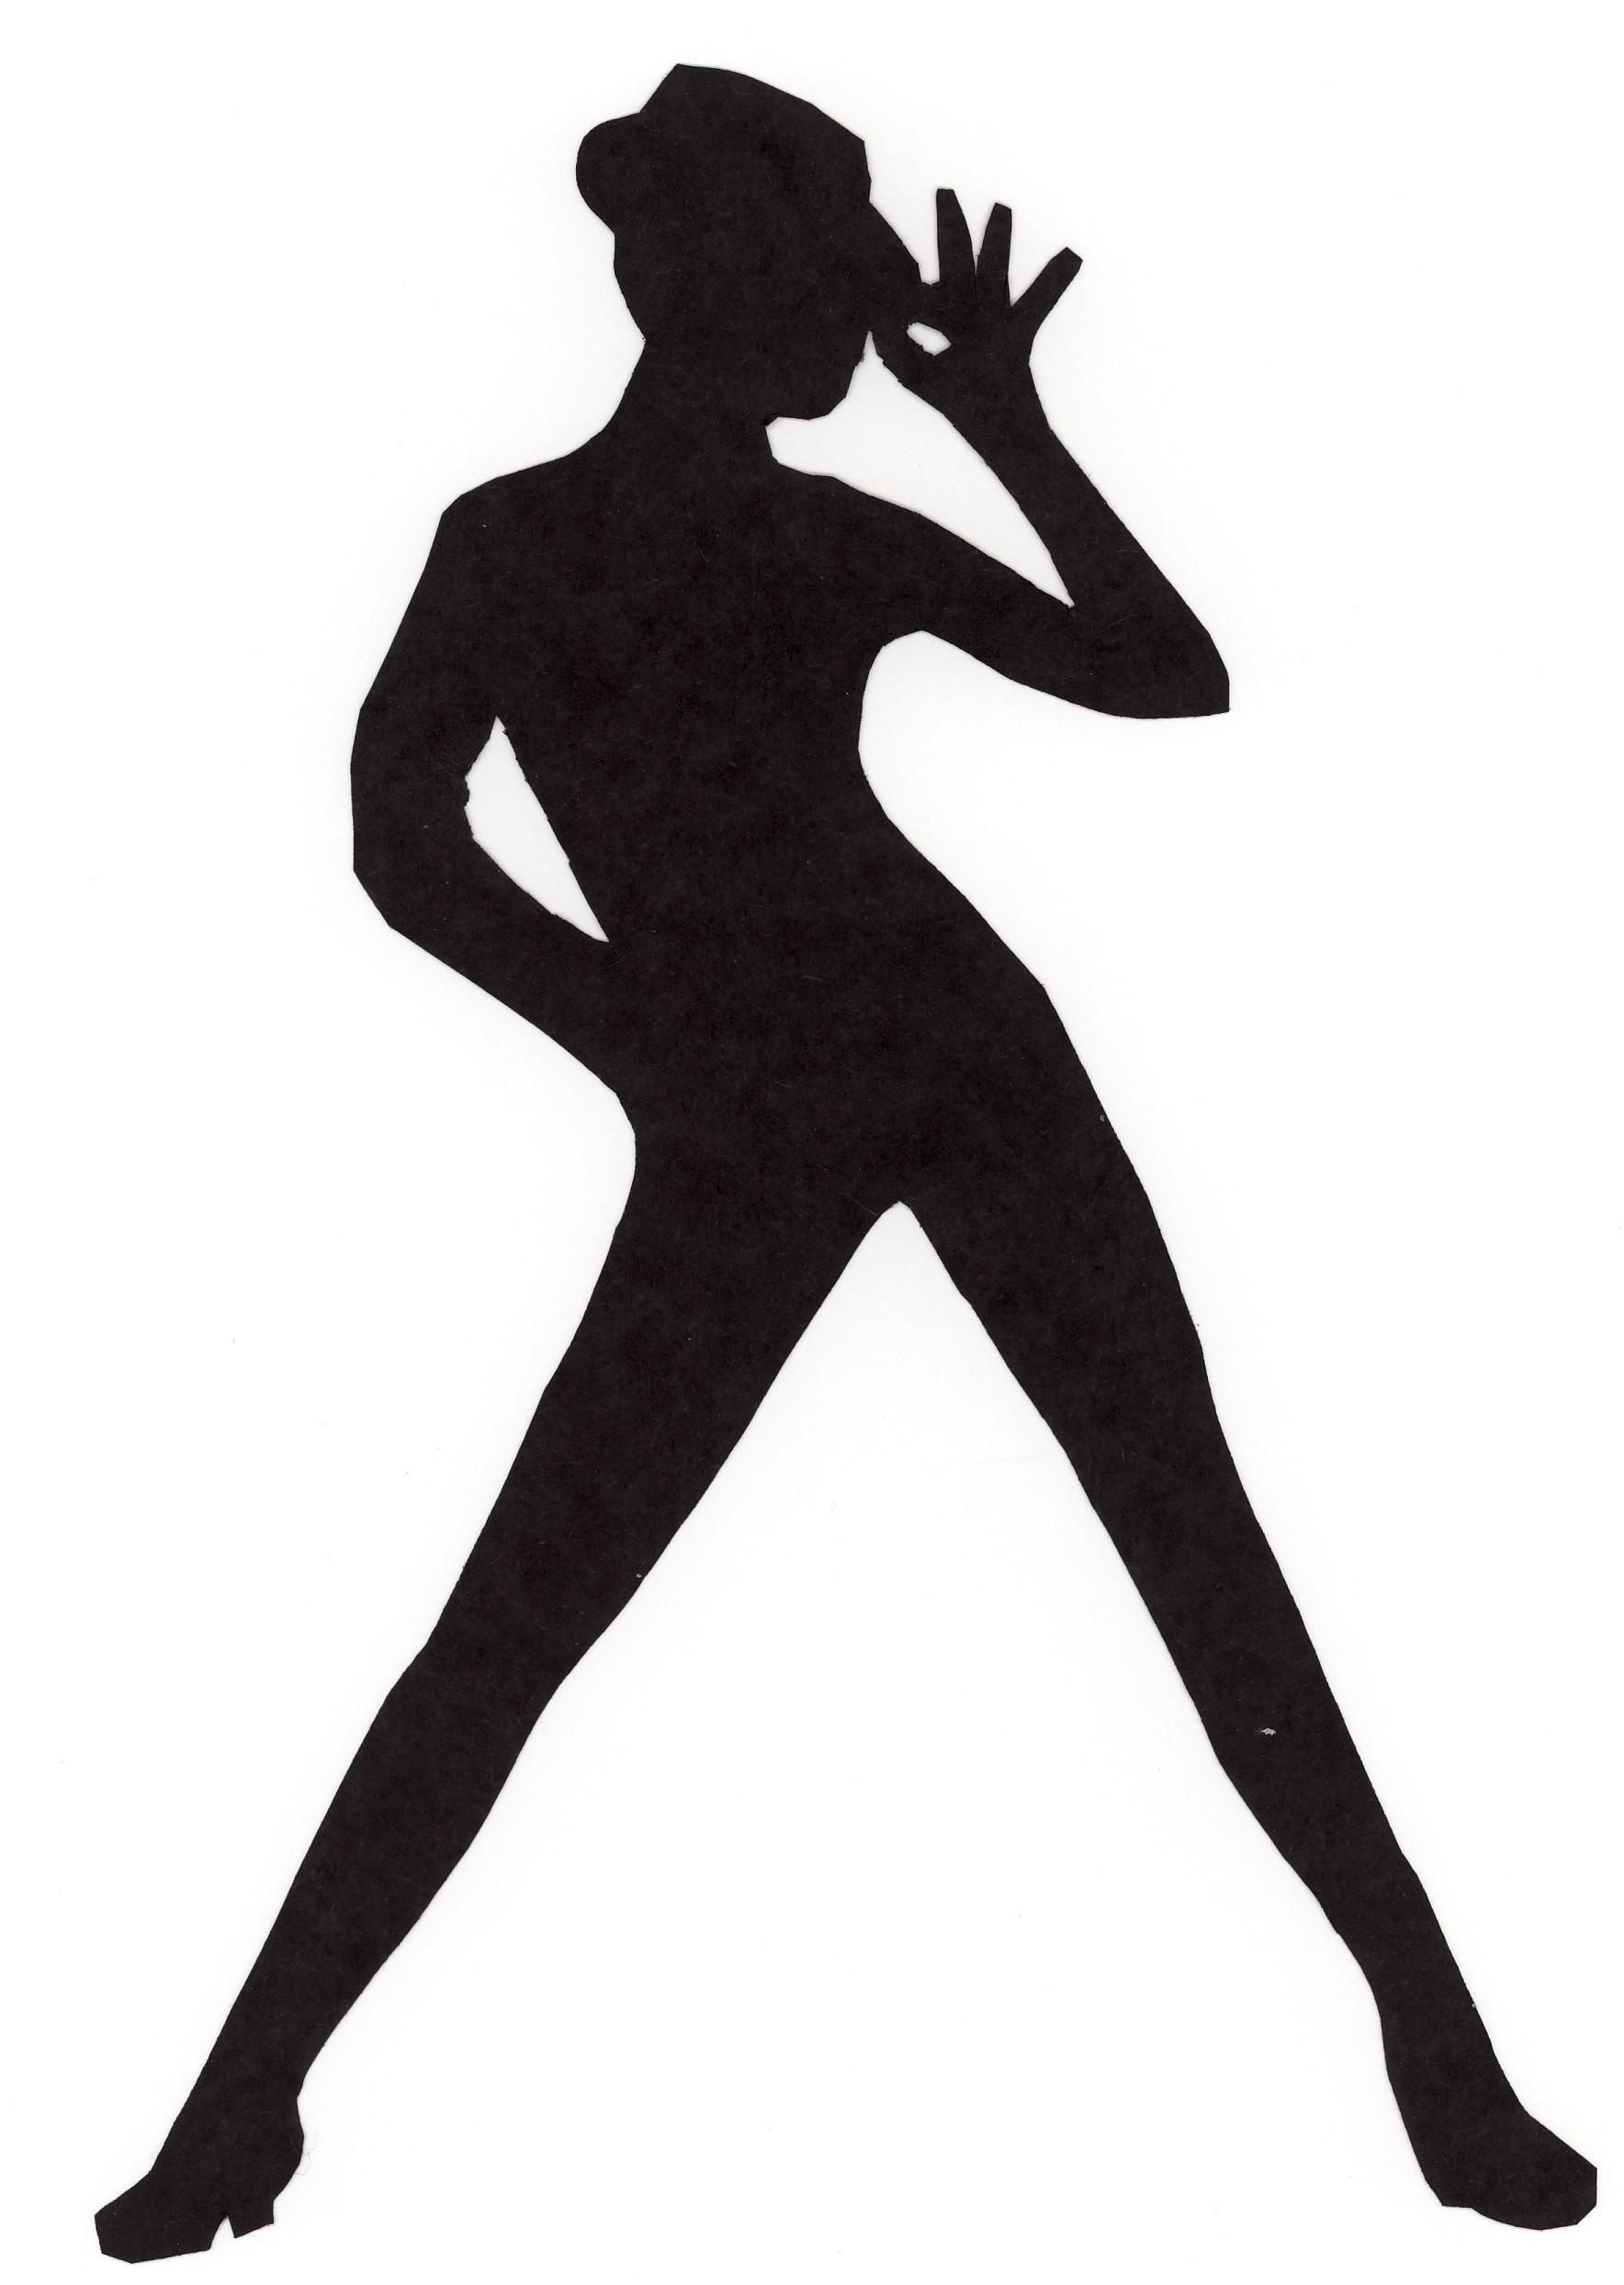 hight resolution of 1768x2487 jazz dancer png silhouette transparent jazz dancer silhouette png